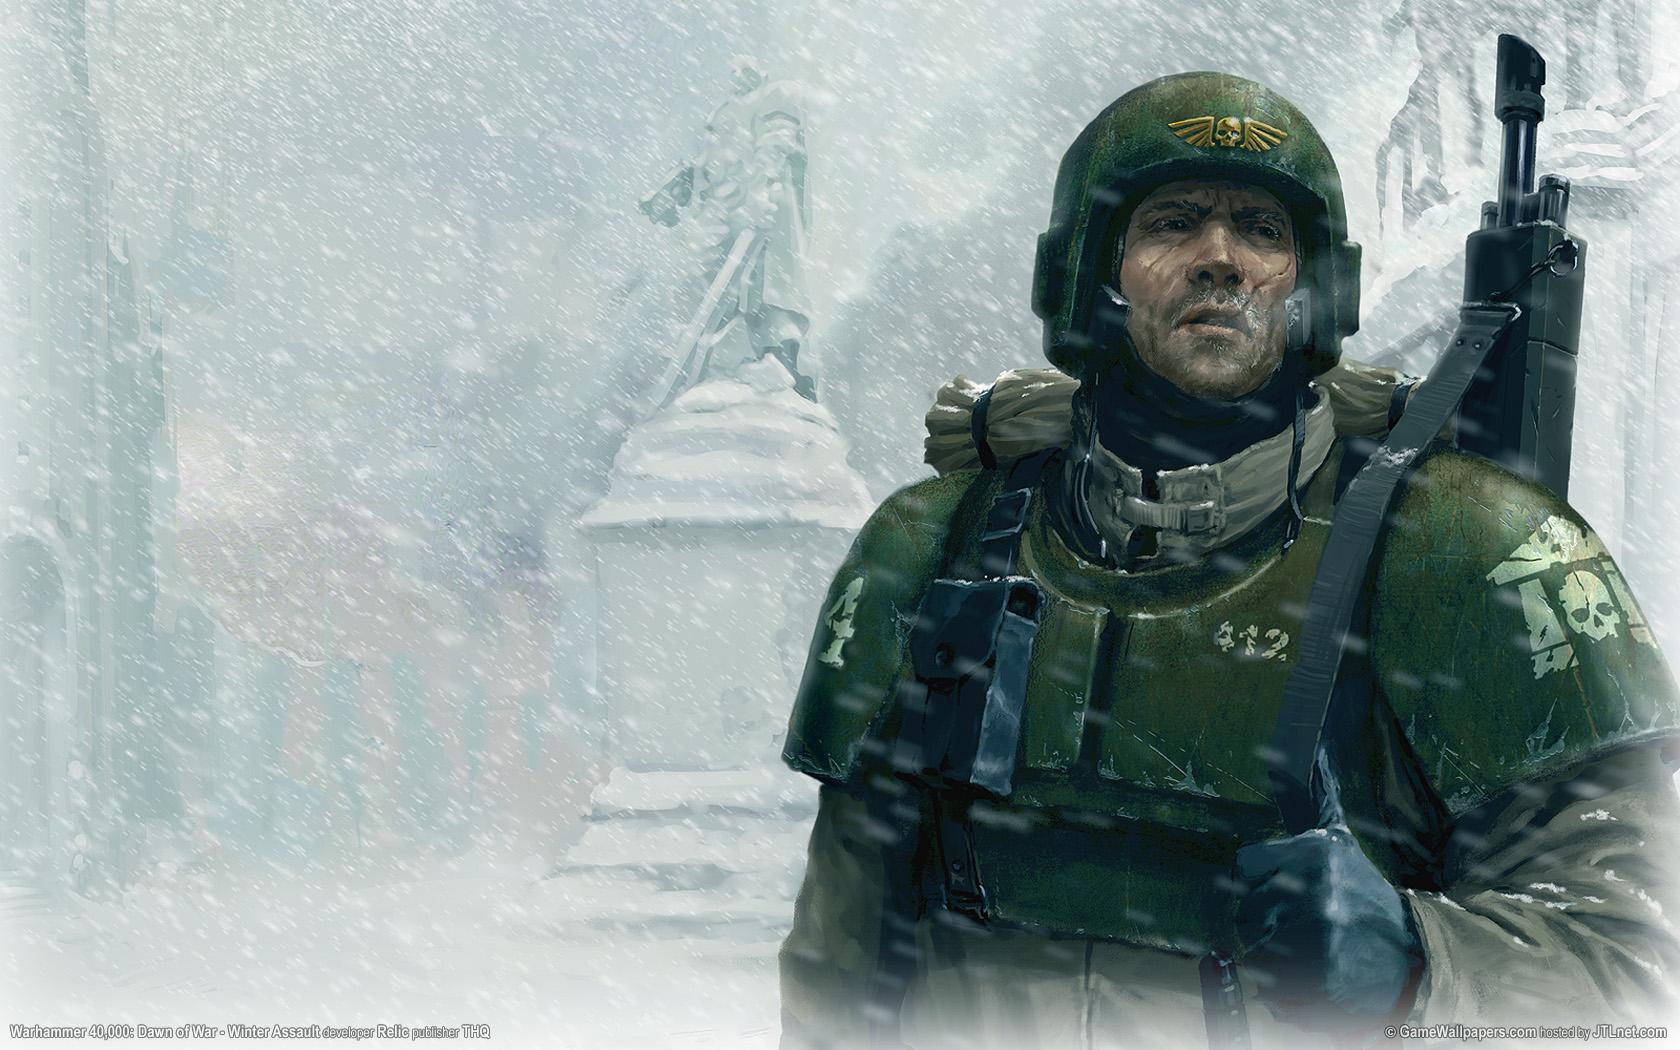 13wg2u?a417816 40k imperial guardsman snow meme generator imgflip,Winter Meme Generator